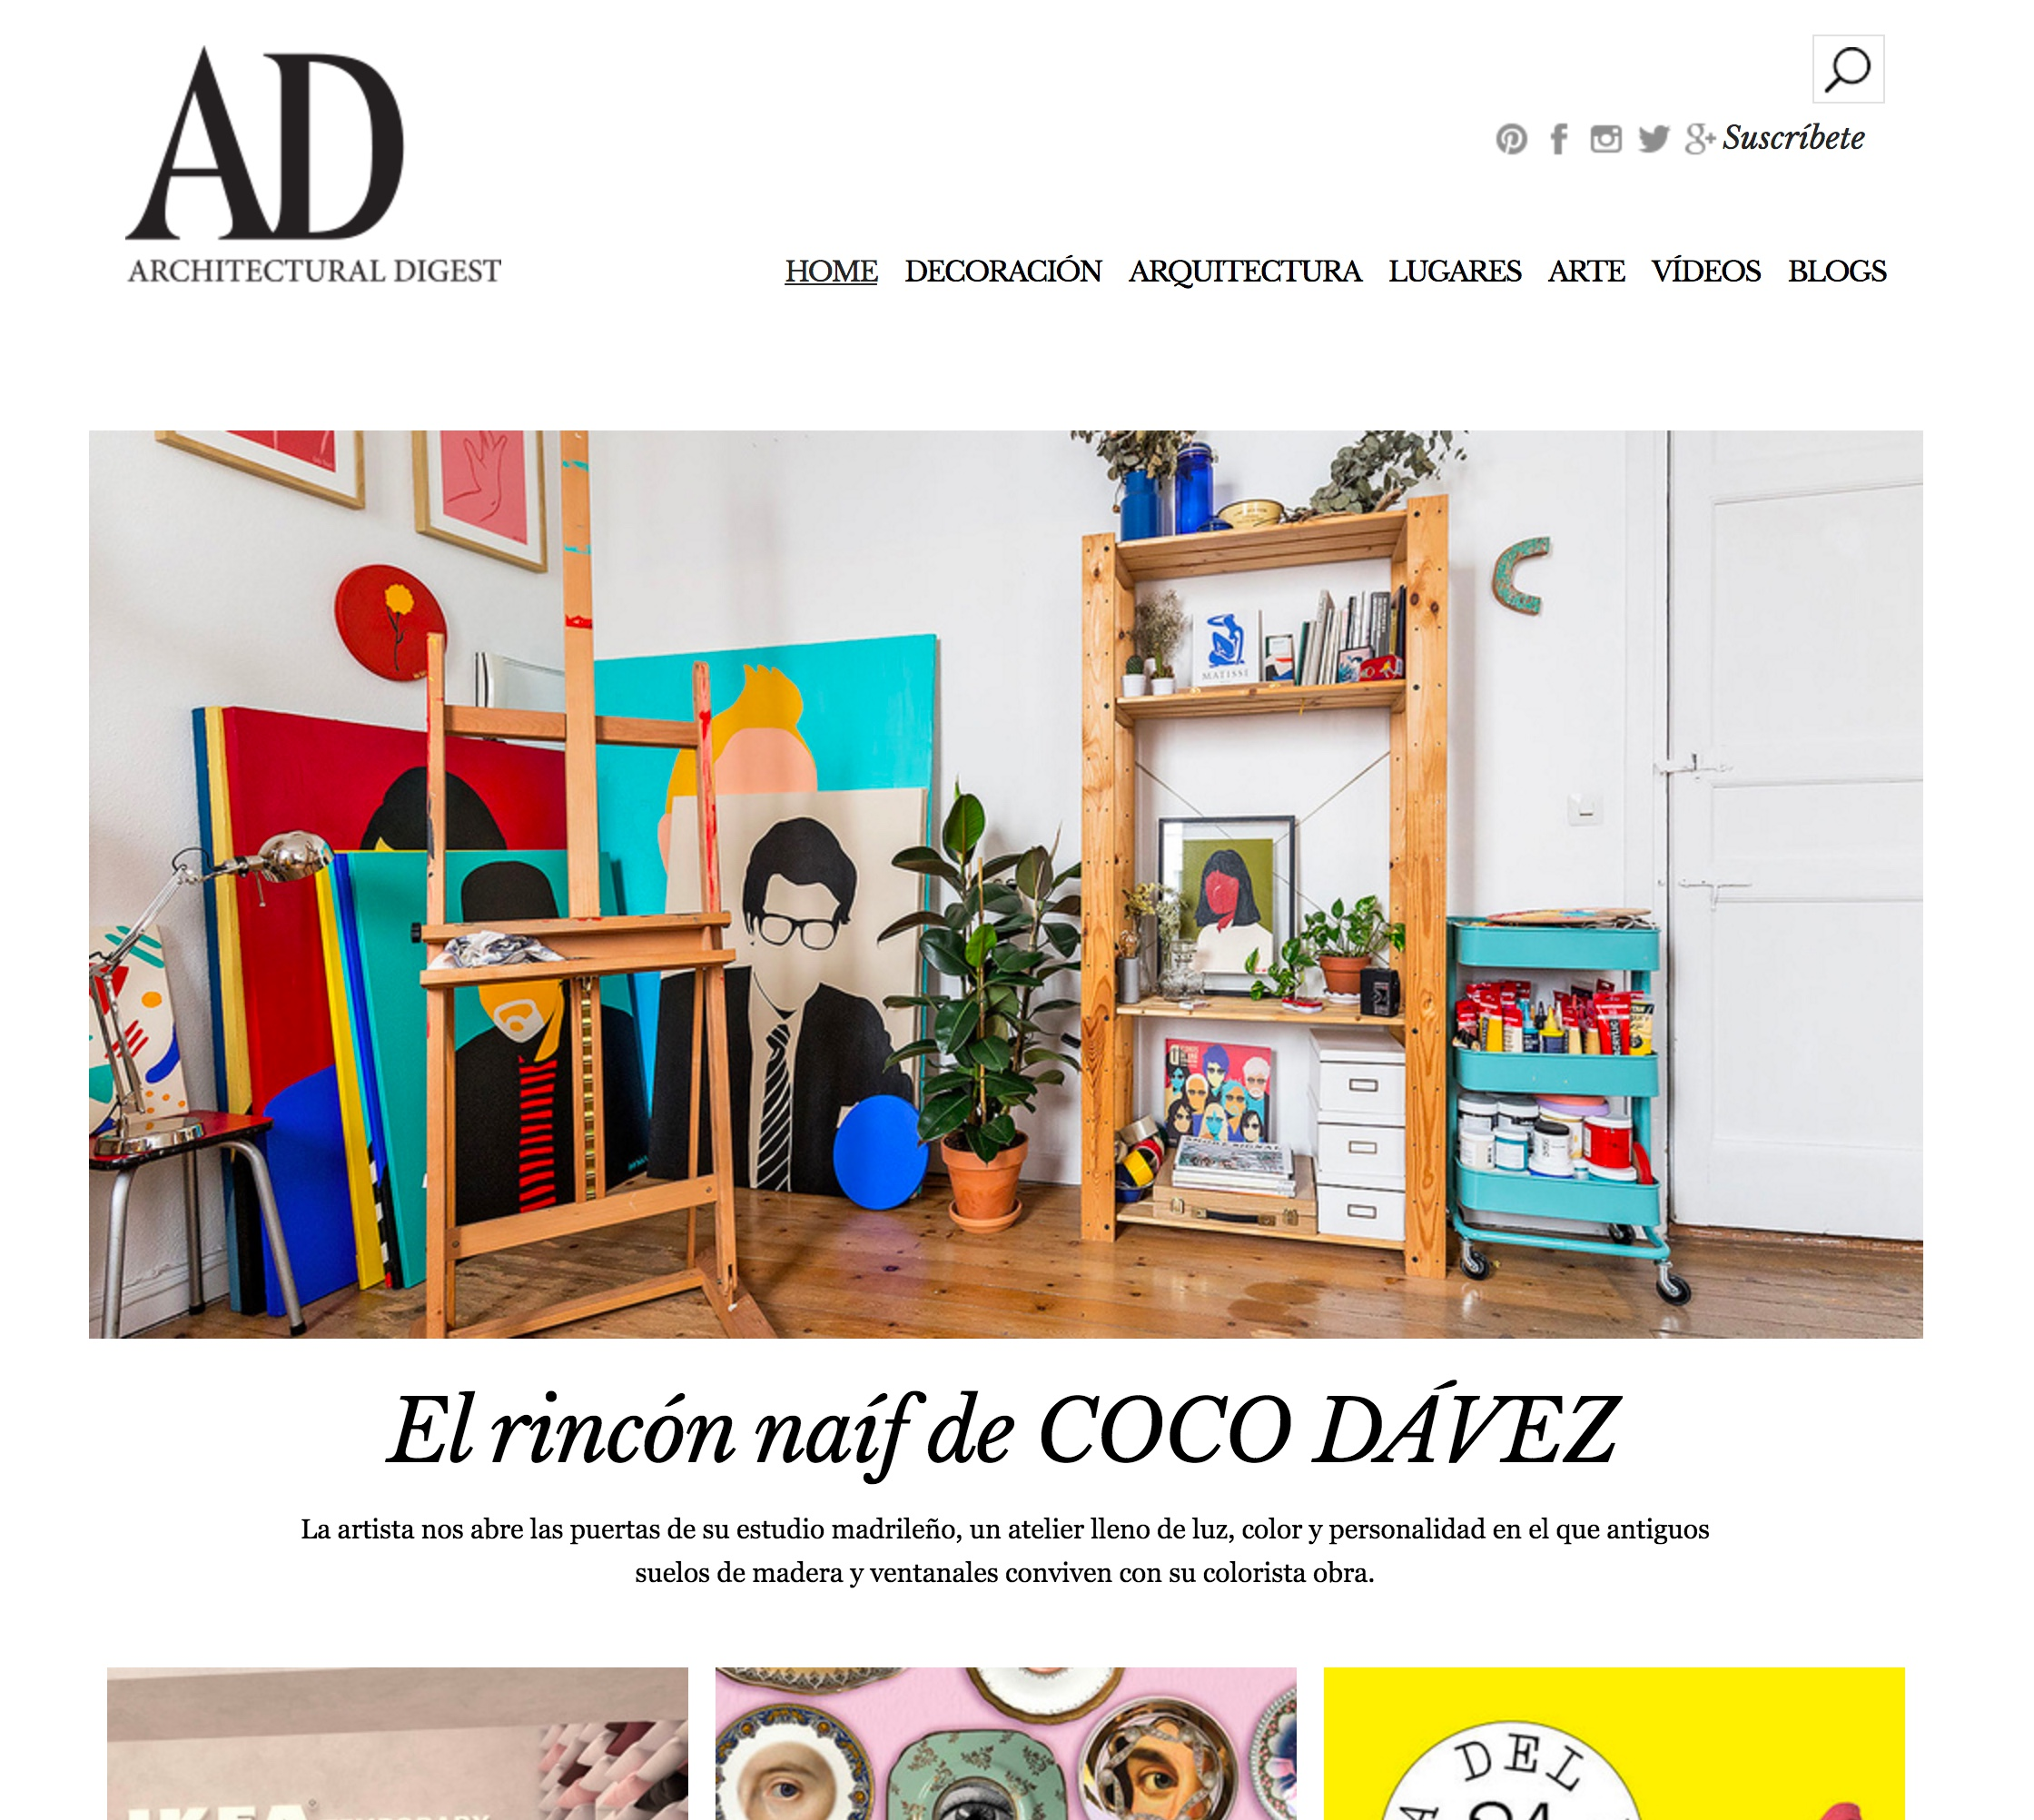 2017-04-24 AD Coco Davez.jpeg